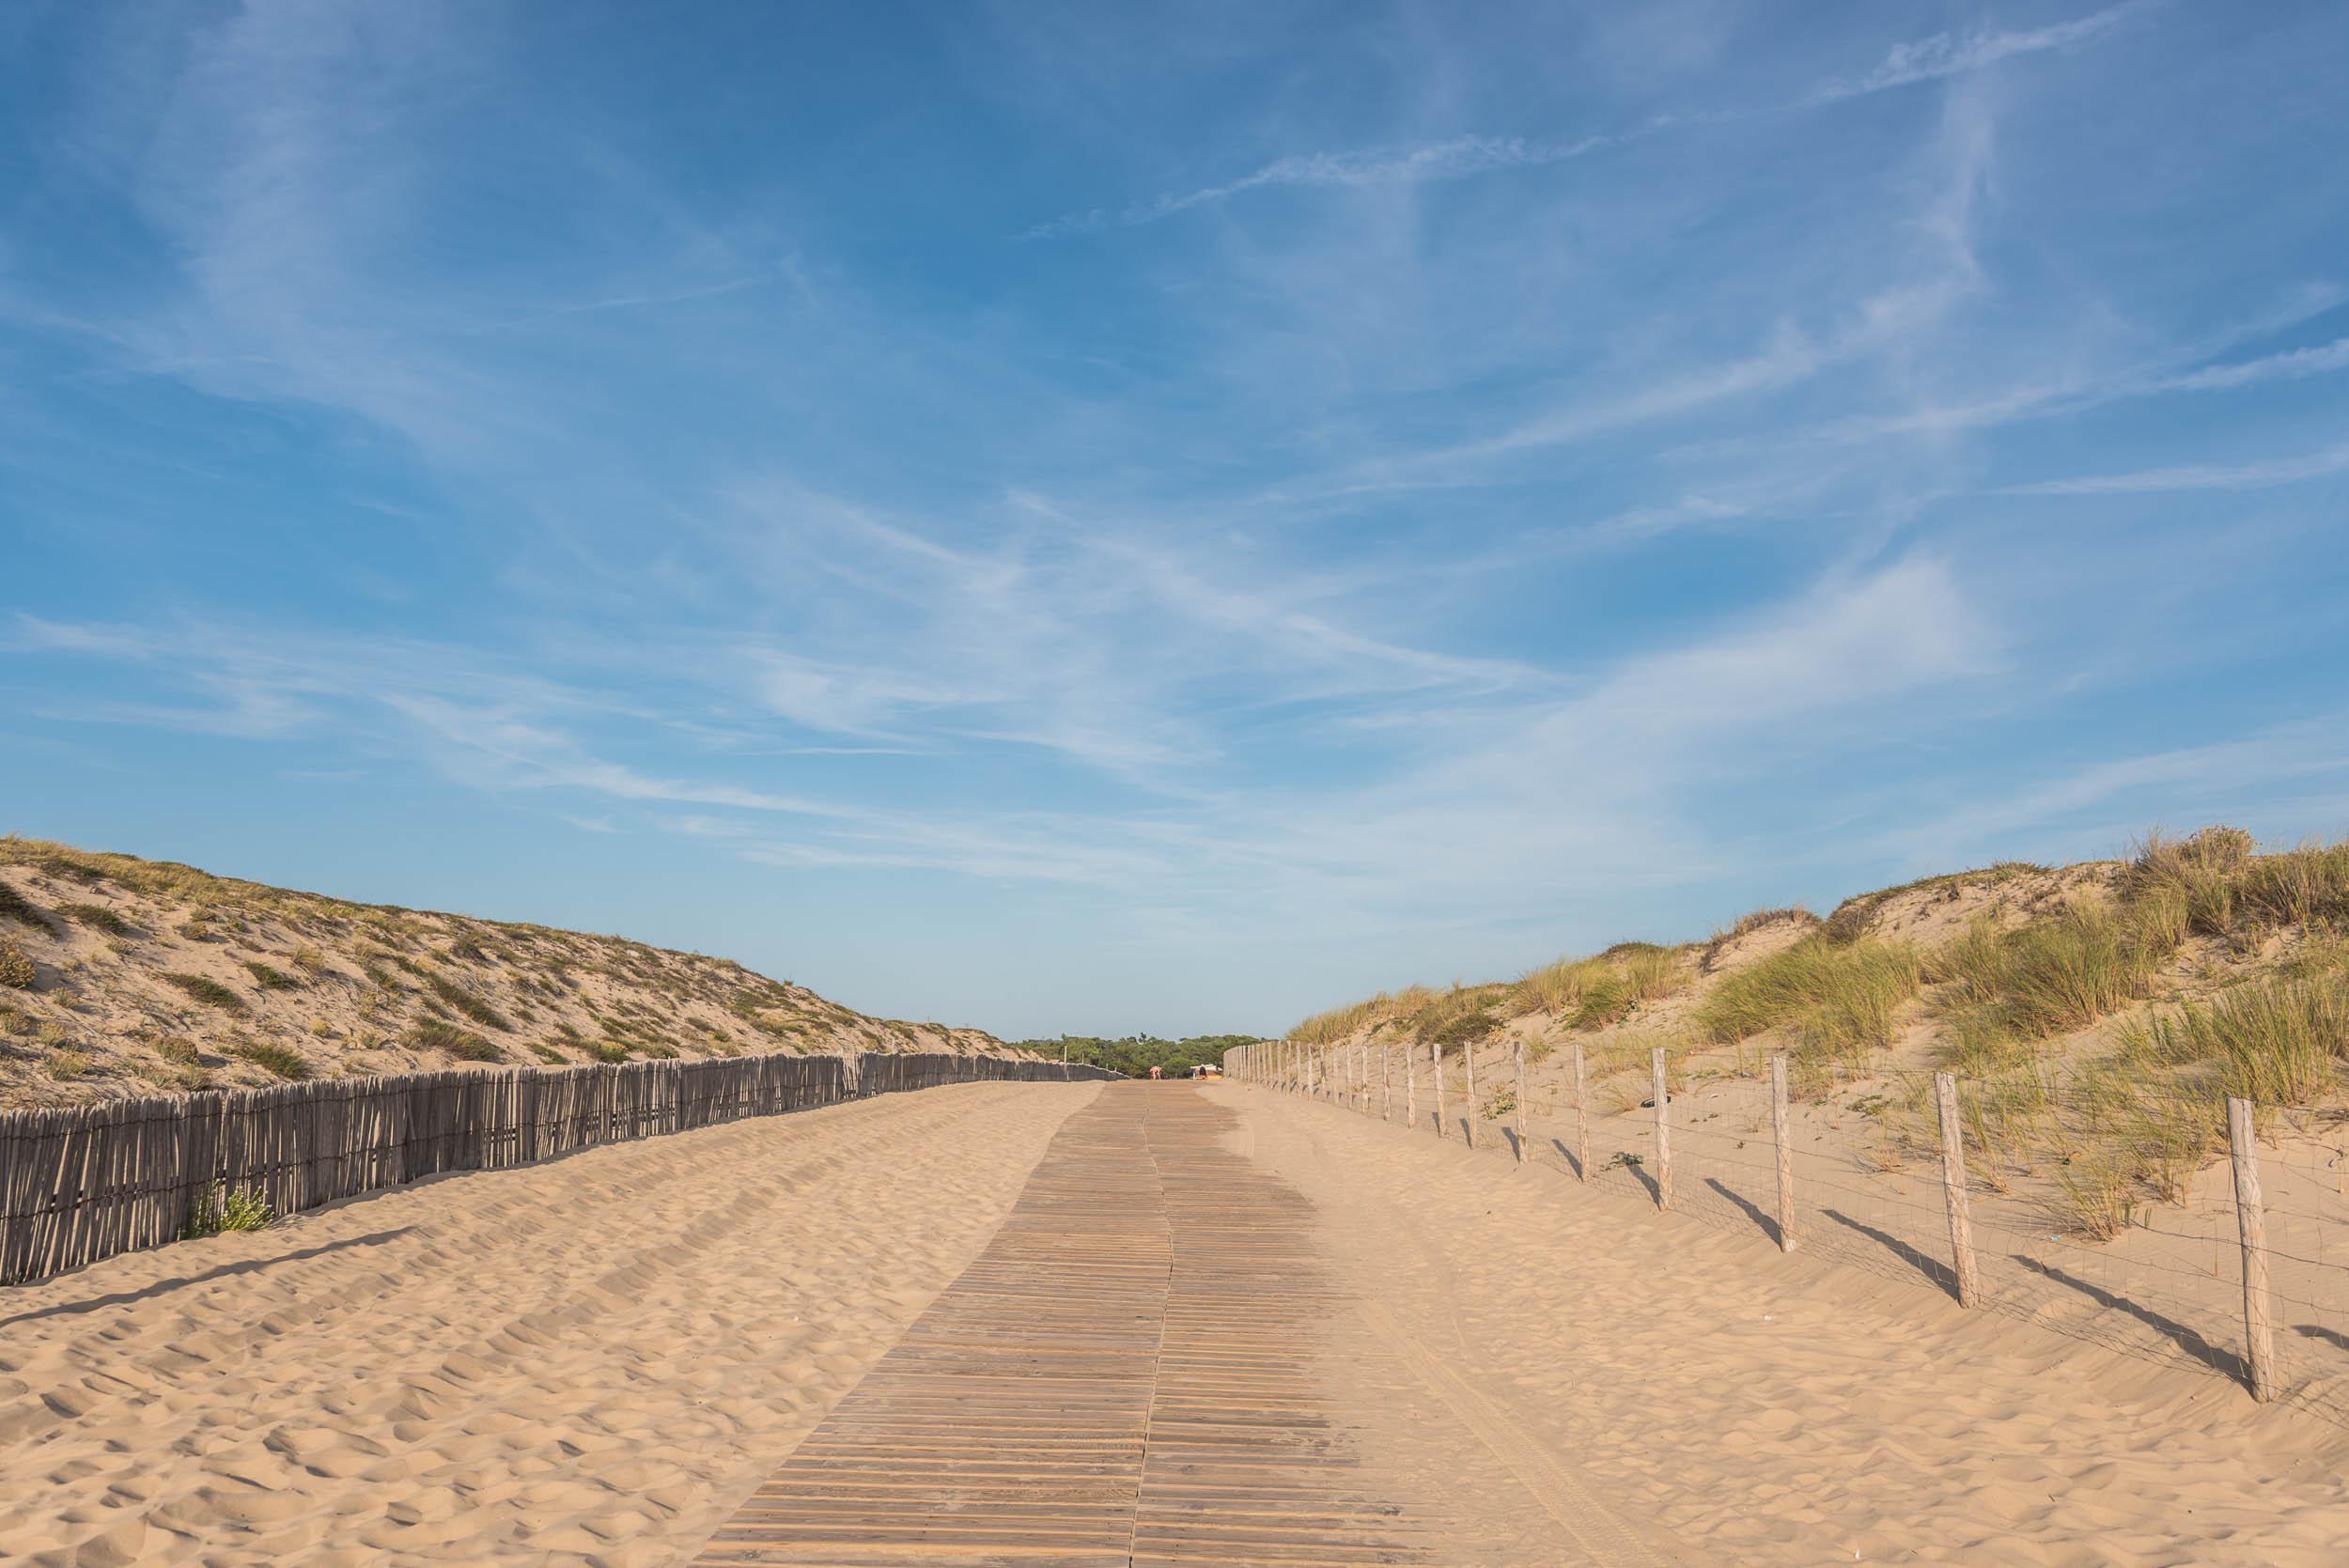 Chemin en direction de la plage